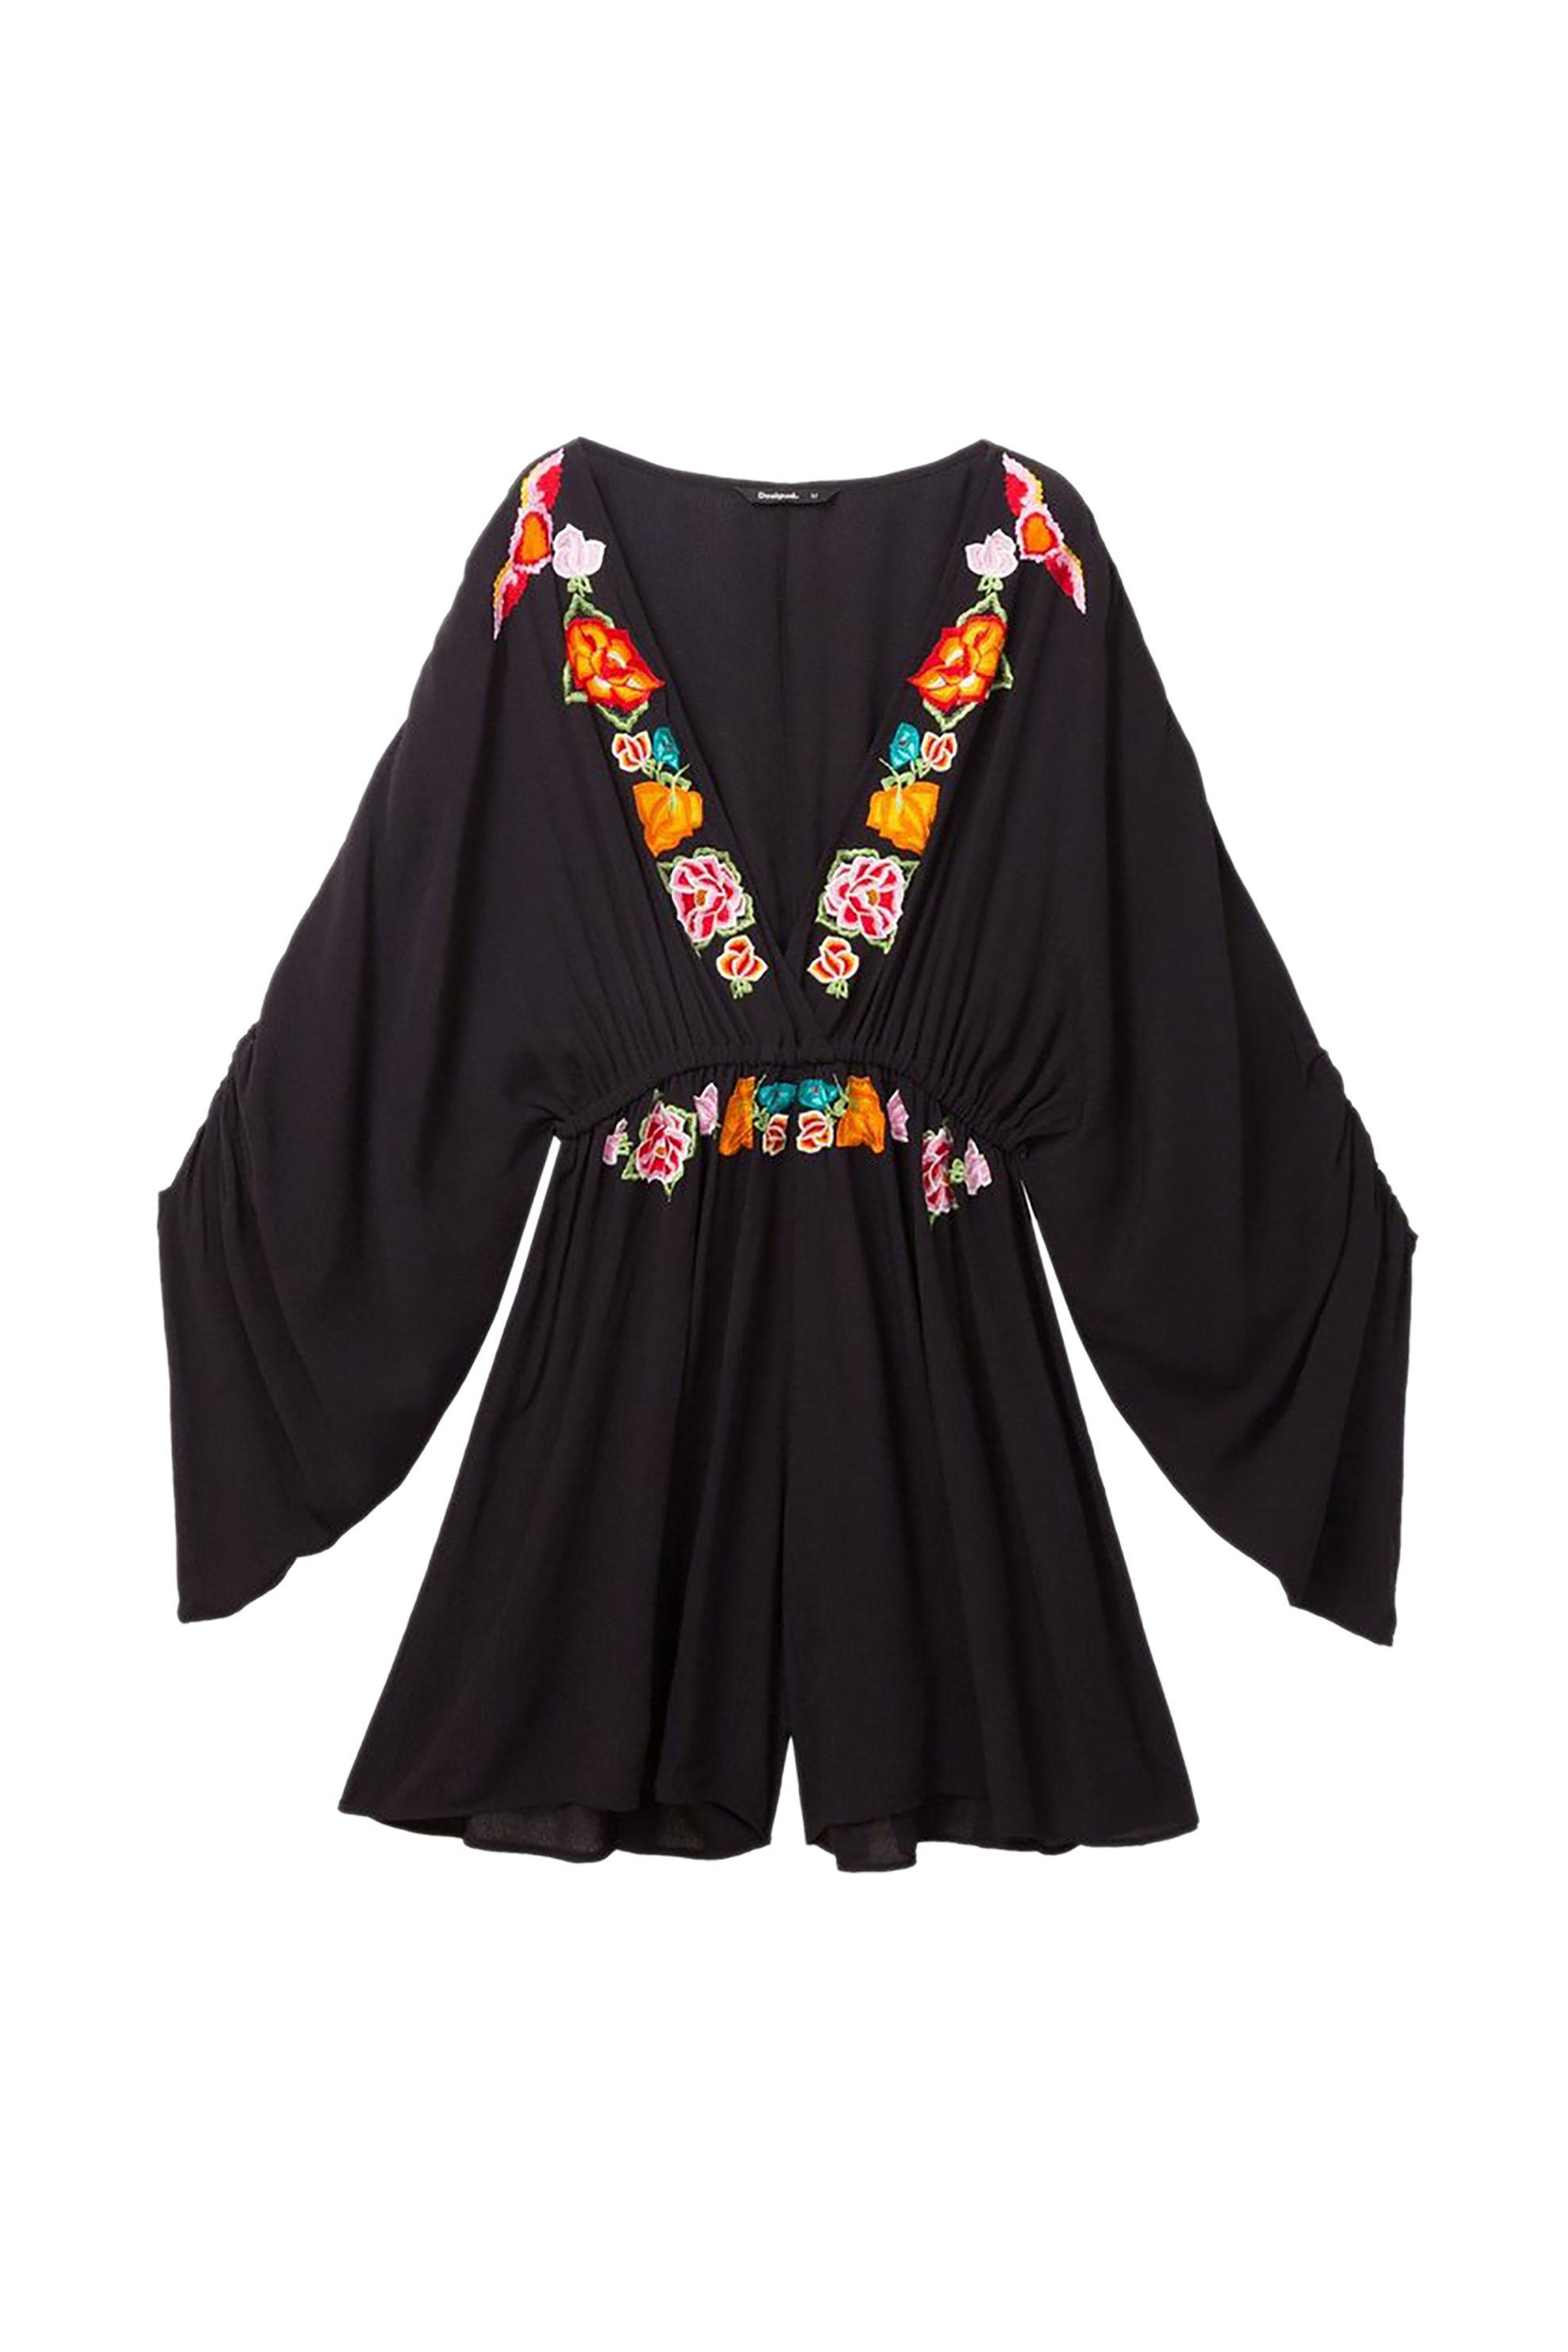 Desigual γυναικεία ολόσωμη φόρμα με κεντήματα Soraya - 19SWPW07 - Μαύρο γυναικα   ρουχα   ολόσωμες φόρμες   σαλοπέτες